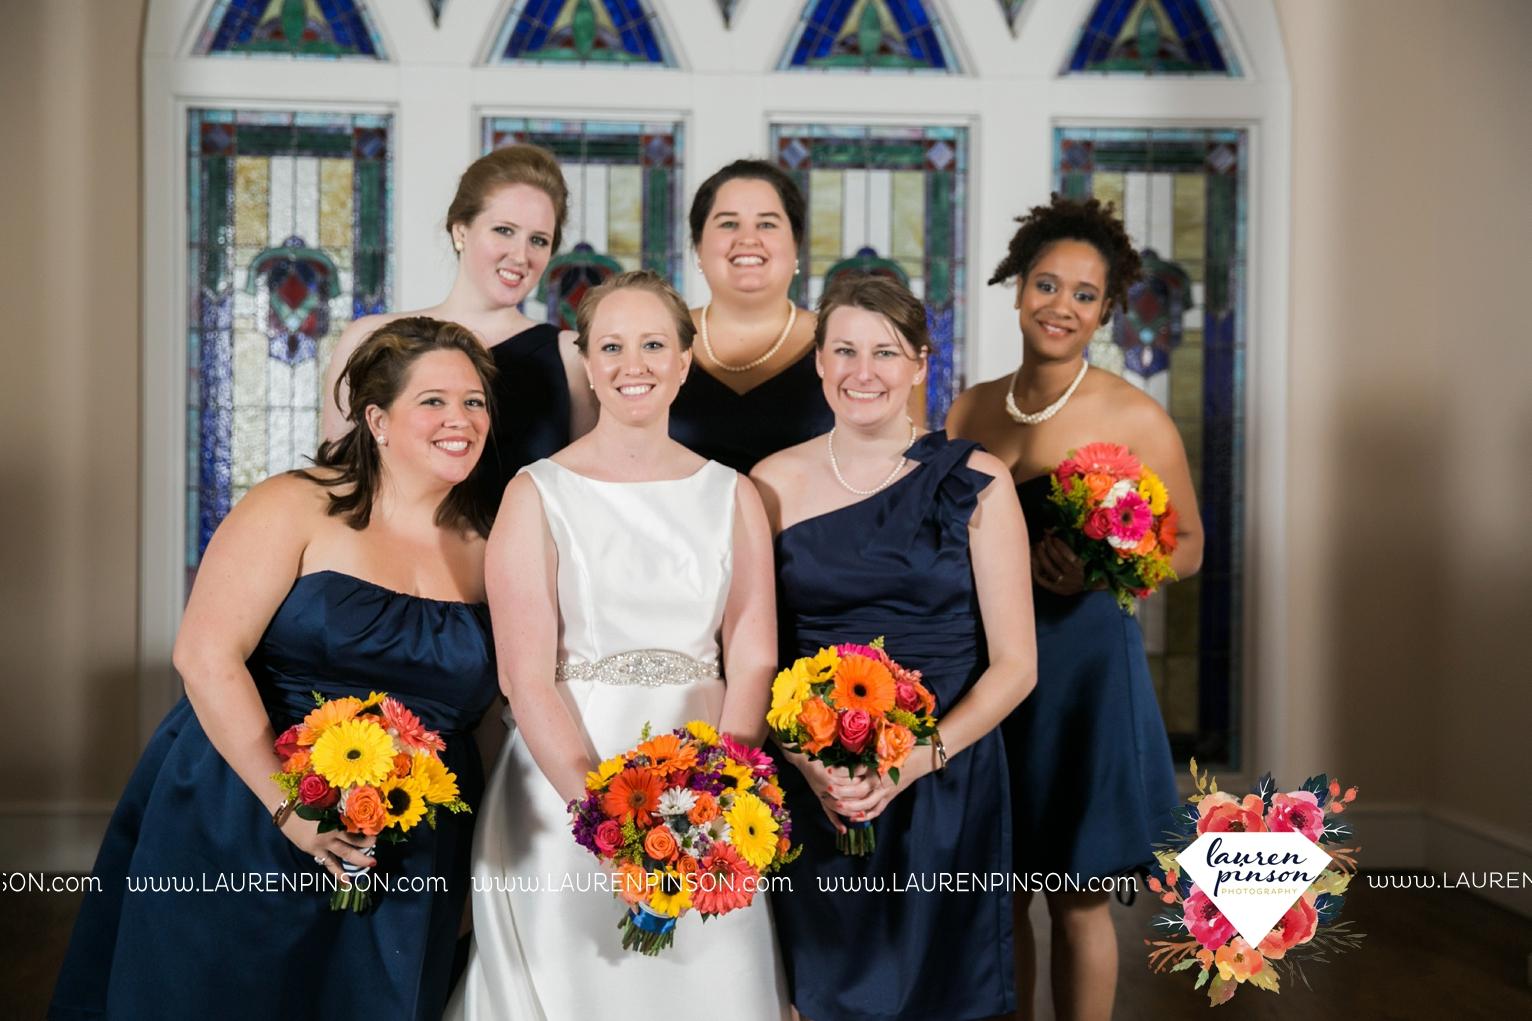 bells-texas-wedding-photography-at-willowood-ranch-chapel-north-texas-wichita-falls-wedding-photographer_1881.jpg